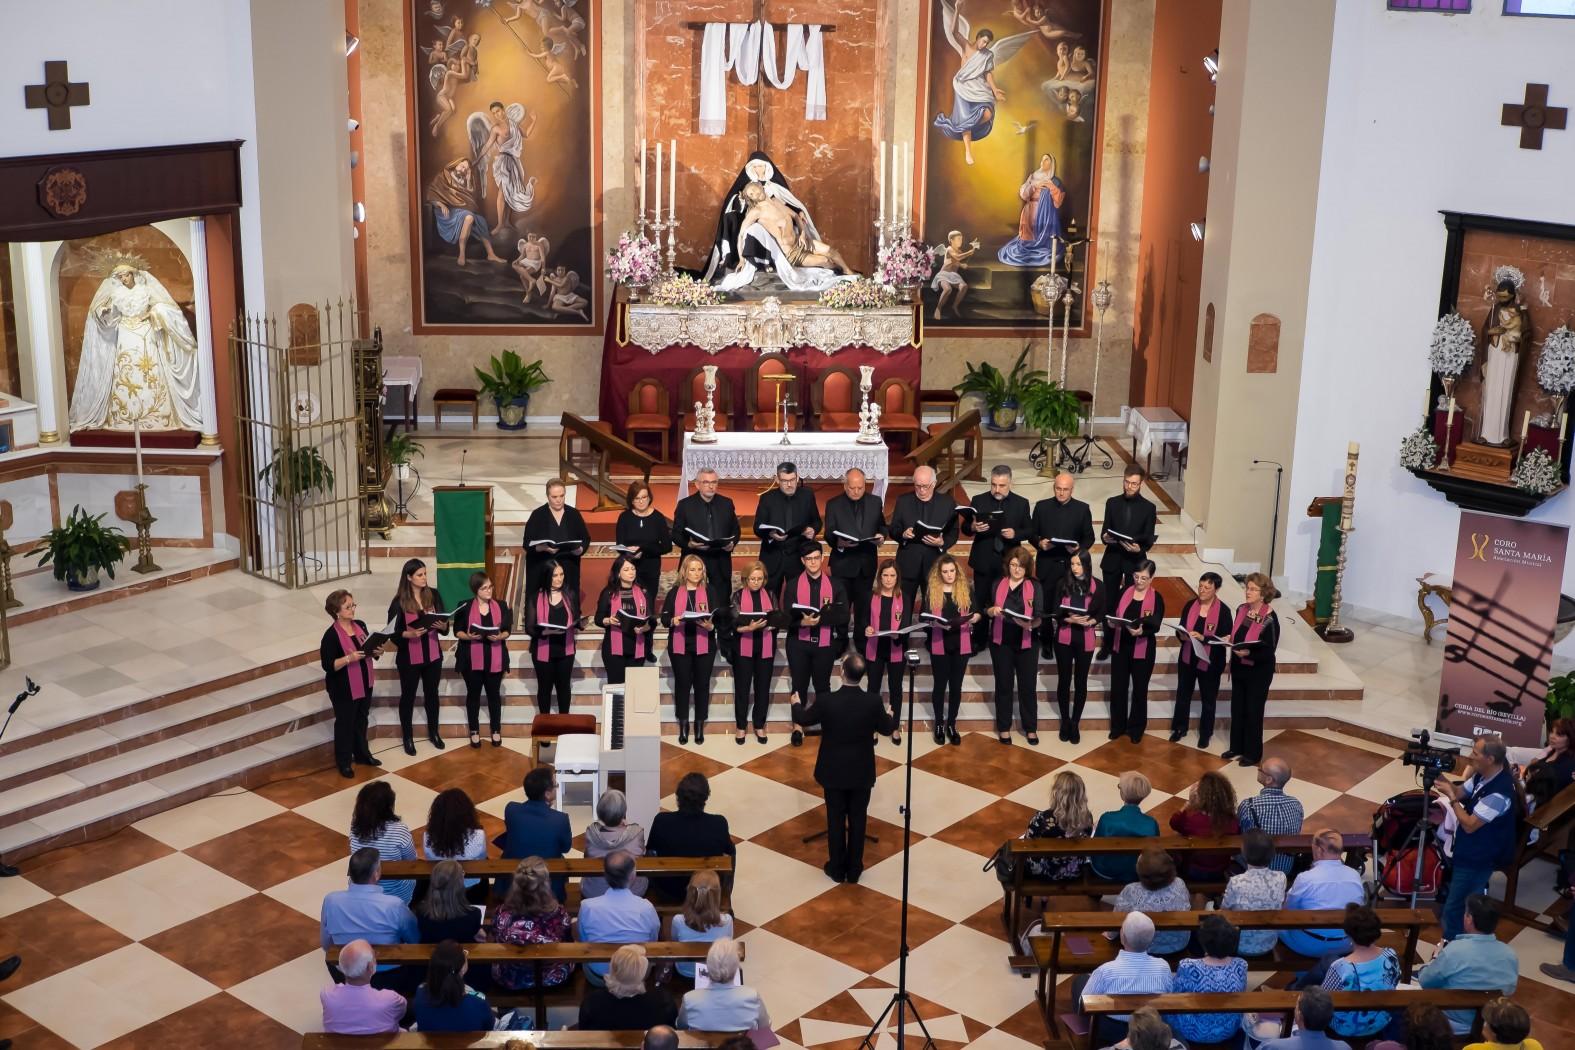 081-coro-santa-maria-090618